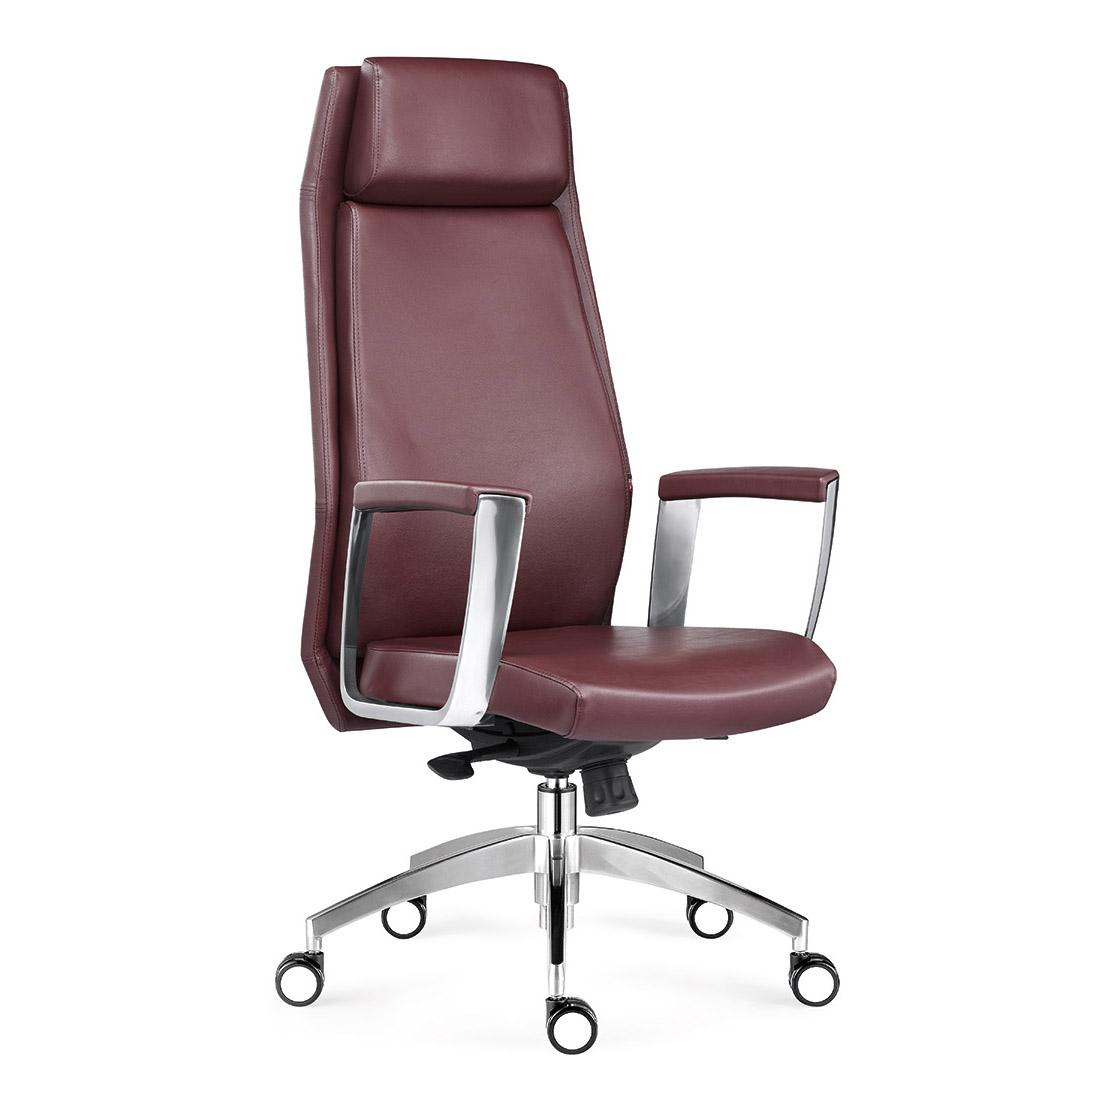 Hangjian Leather Executive Office Chair,High Quality Meeting Chair